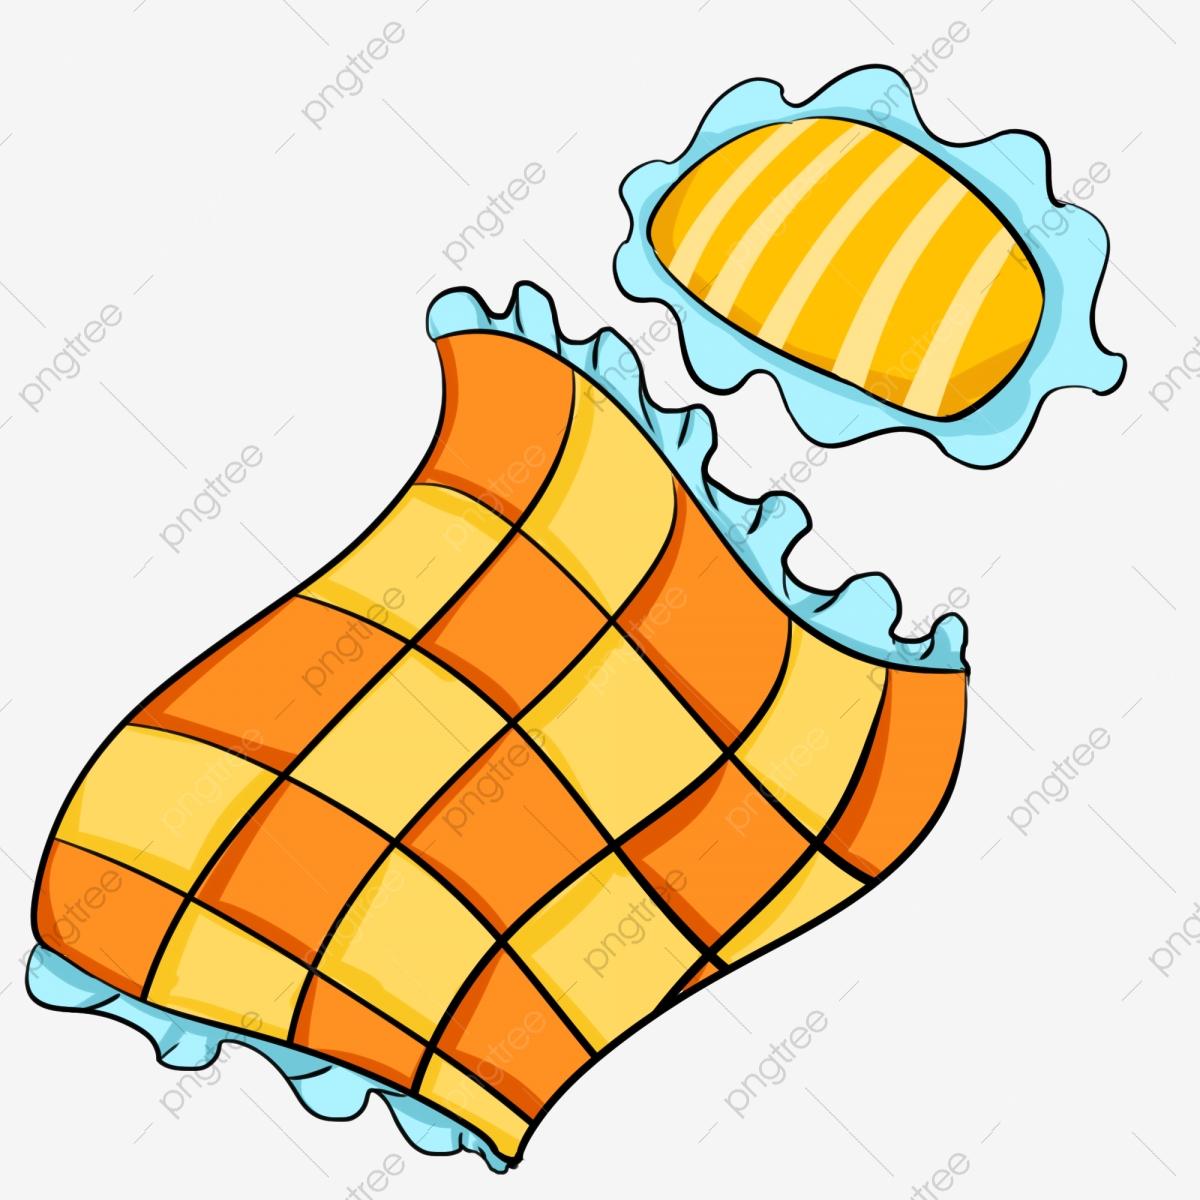 Quilt clipart orange. Yellow checkered beautiful plaid